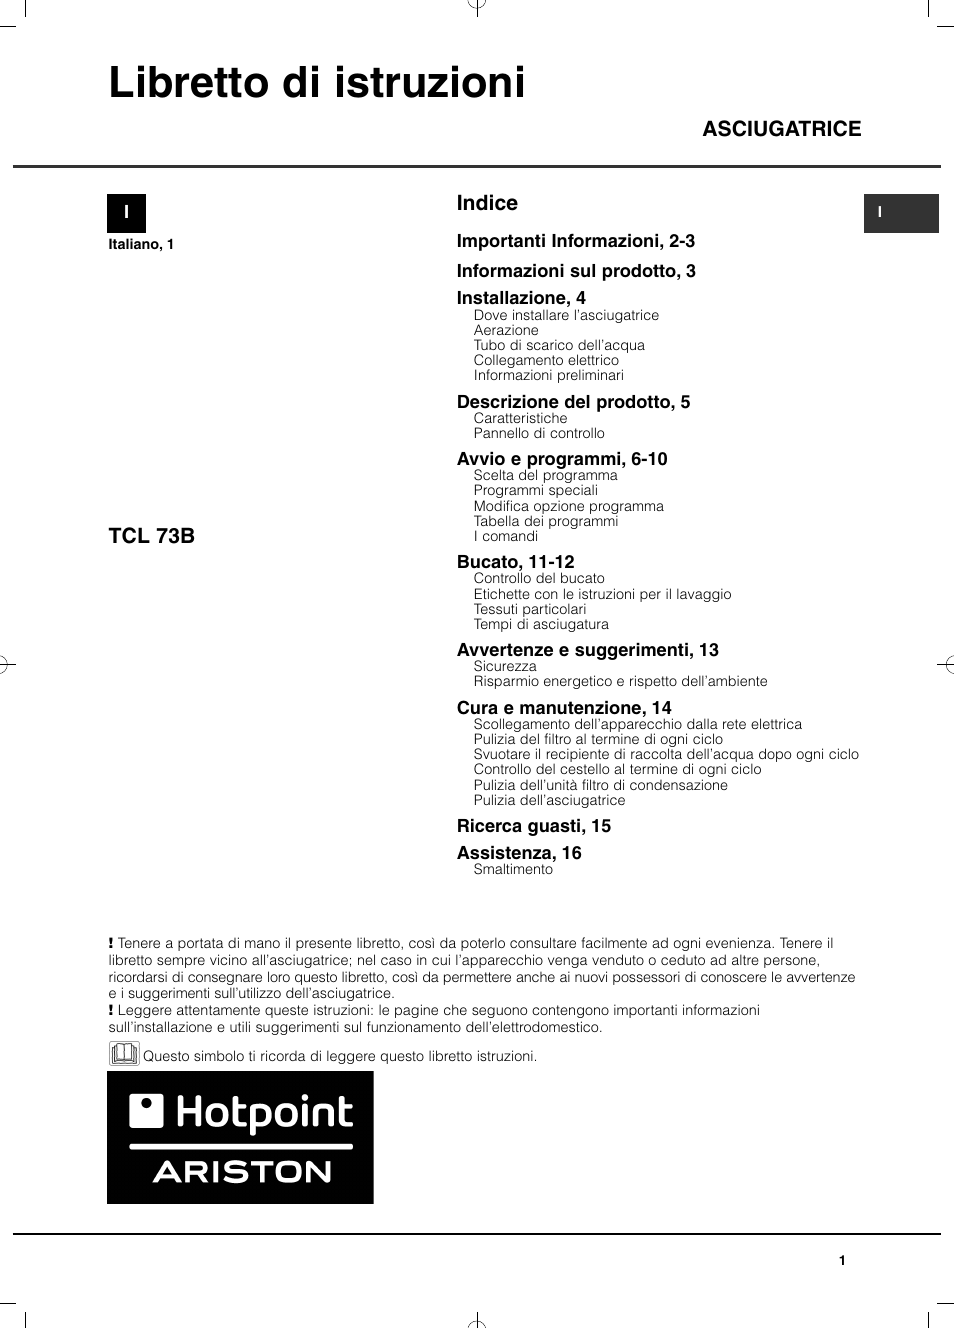 Hotpoint ariston tcl 73b 6p z it manuale d 39 uso pagine 16 for Caldaia ariston egis manuale d uso